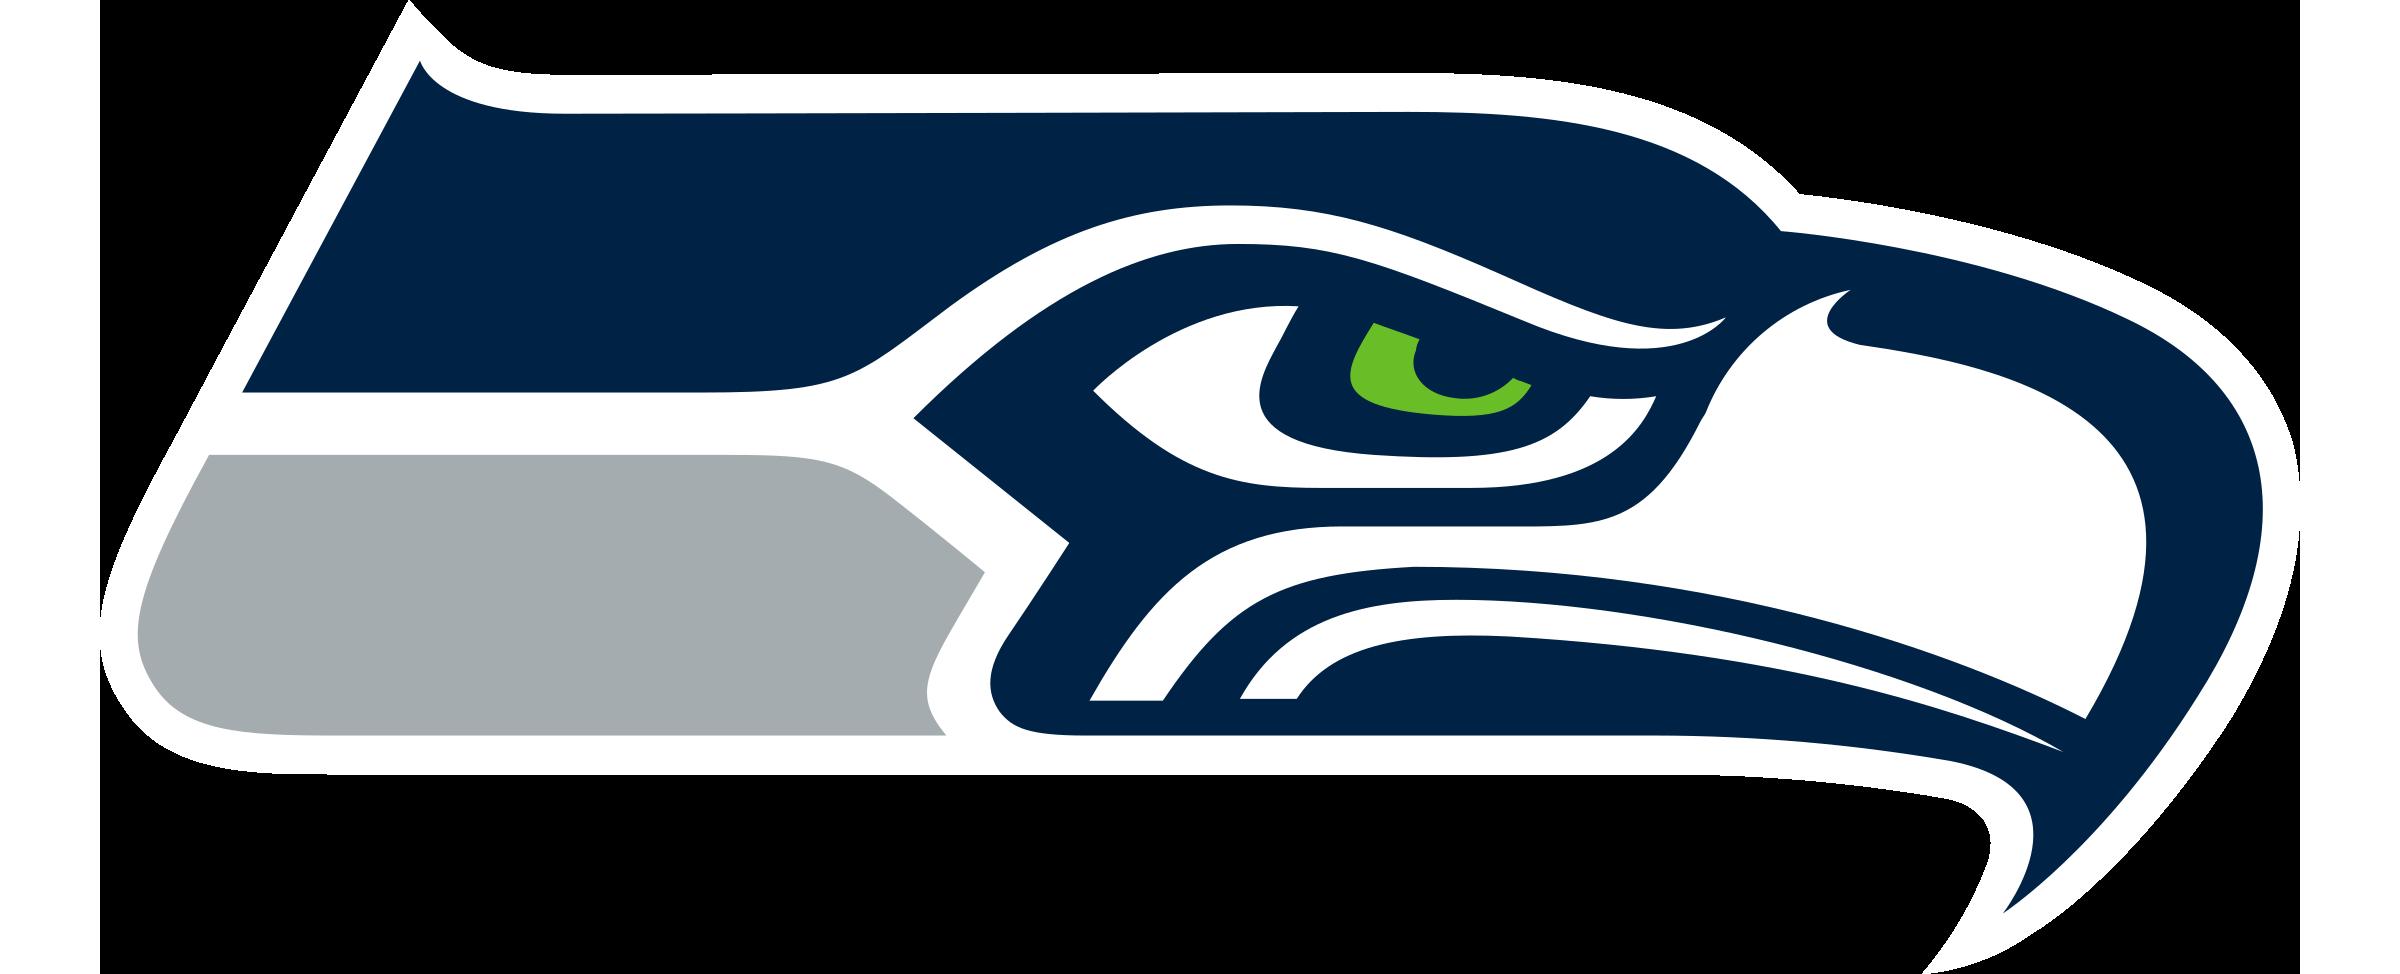 image royalty free stock Seahawks svg. Seattle logo png transparent